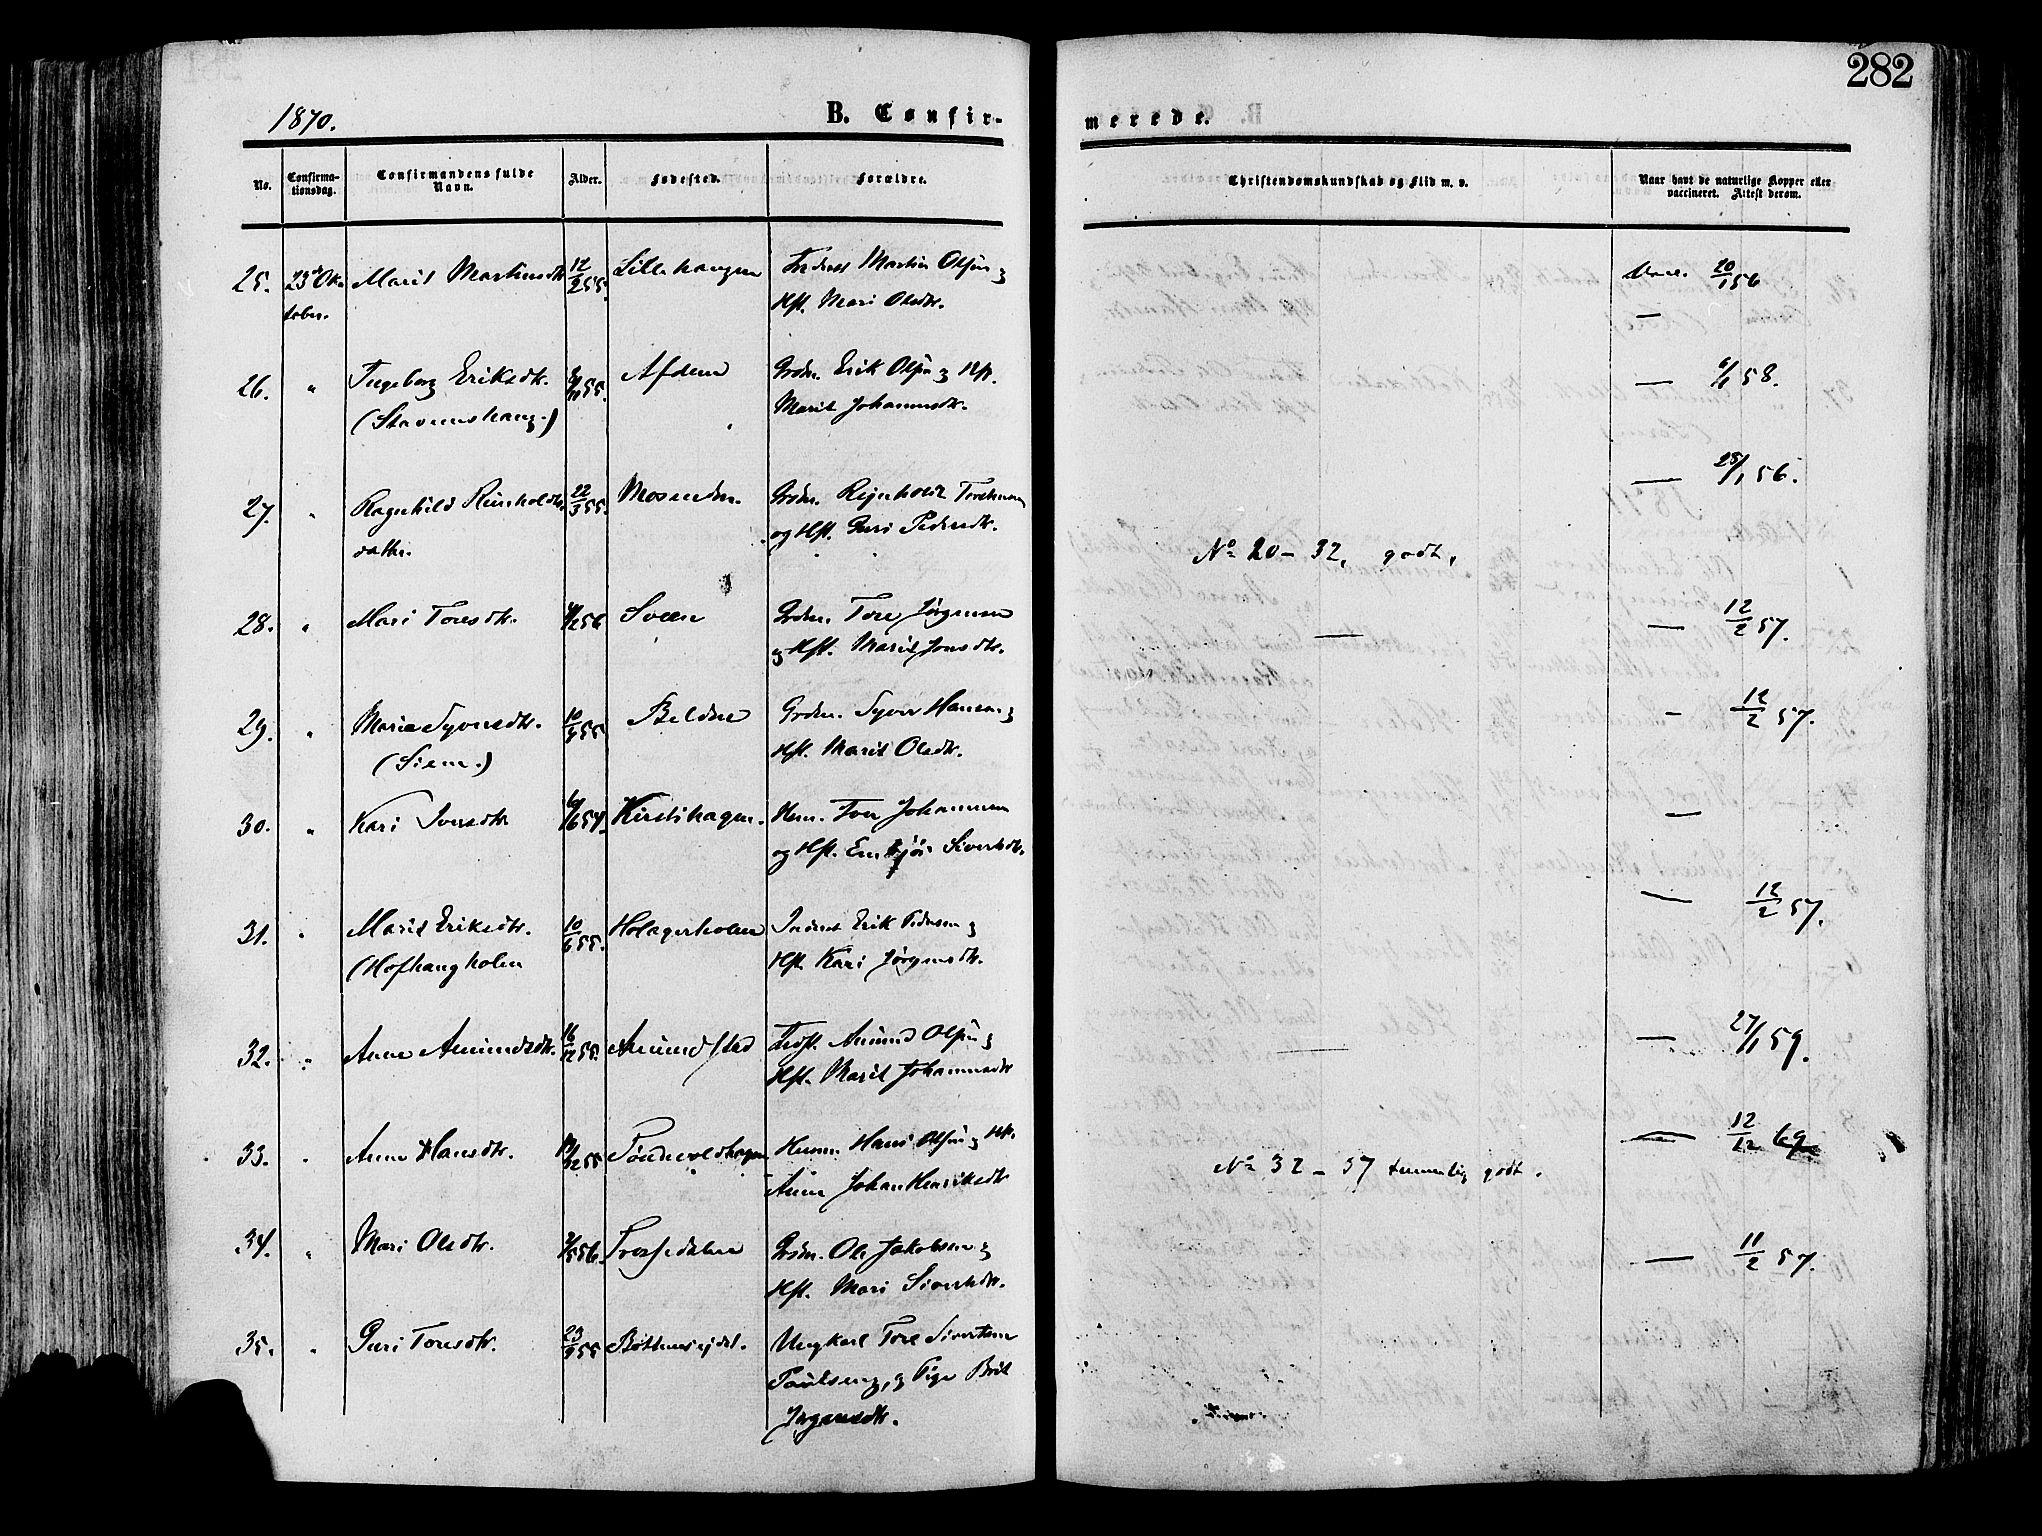 SAH, Lesja prestekontor, Ministerialbok nr. 8, 1854-1880, s. 282